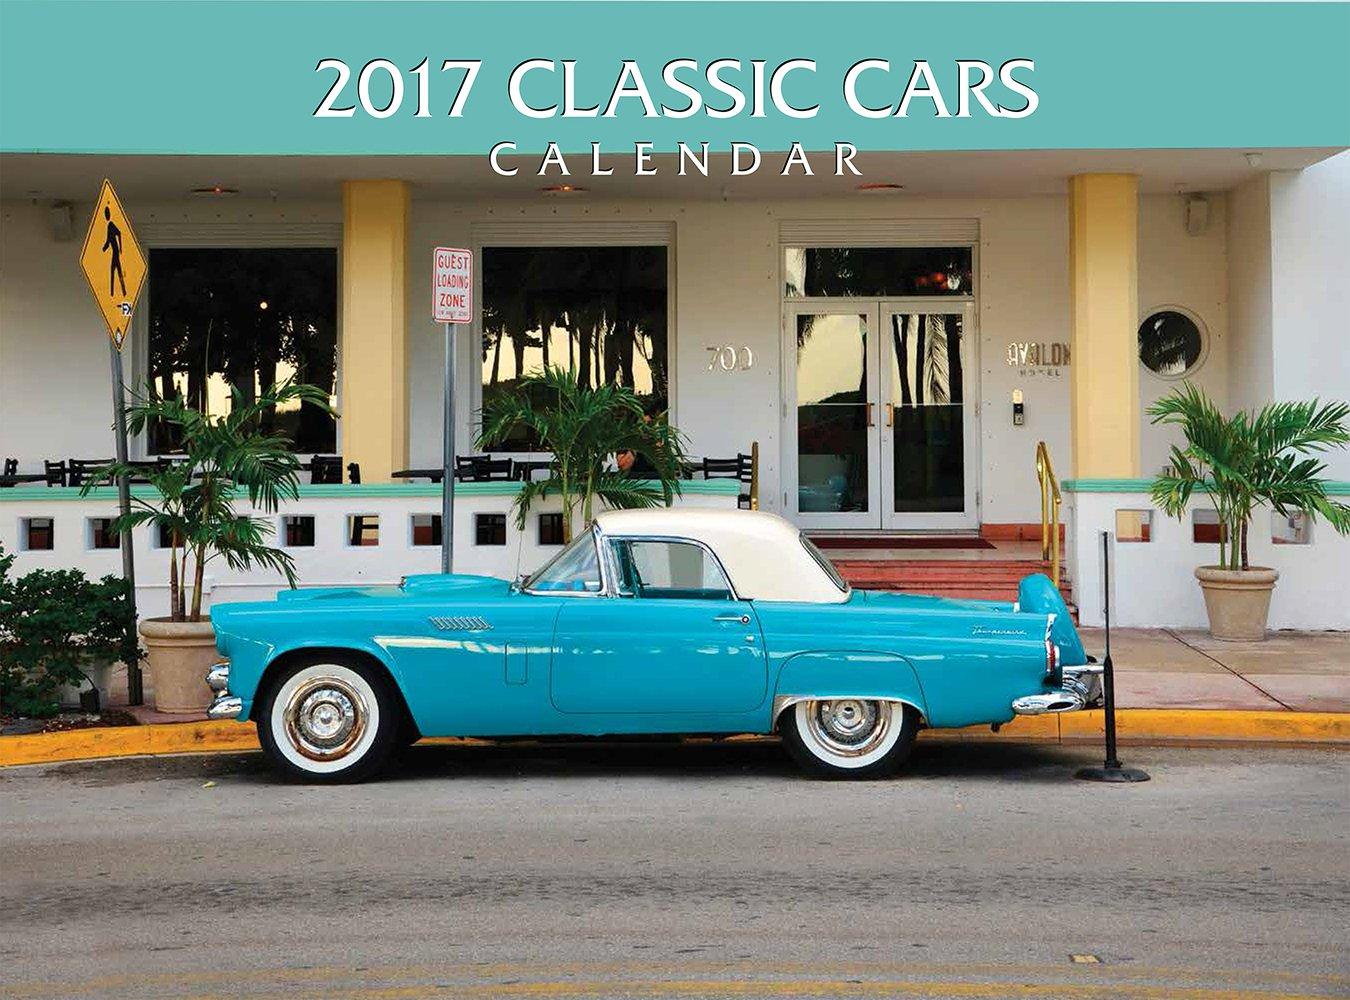 2017 Classic Cars Calendar